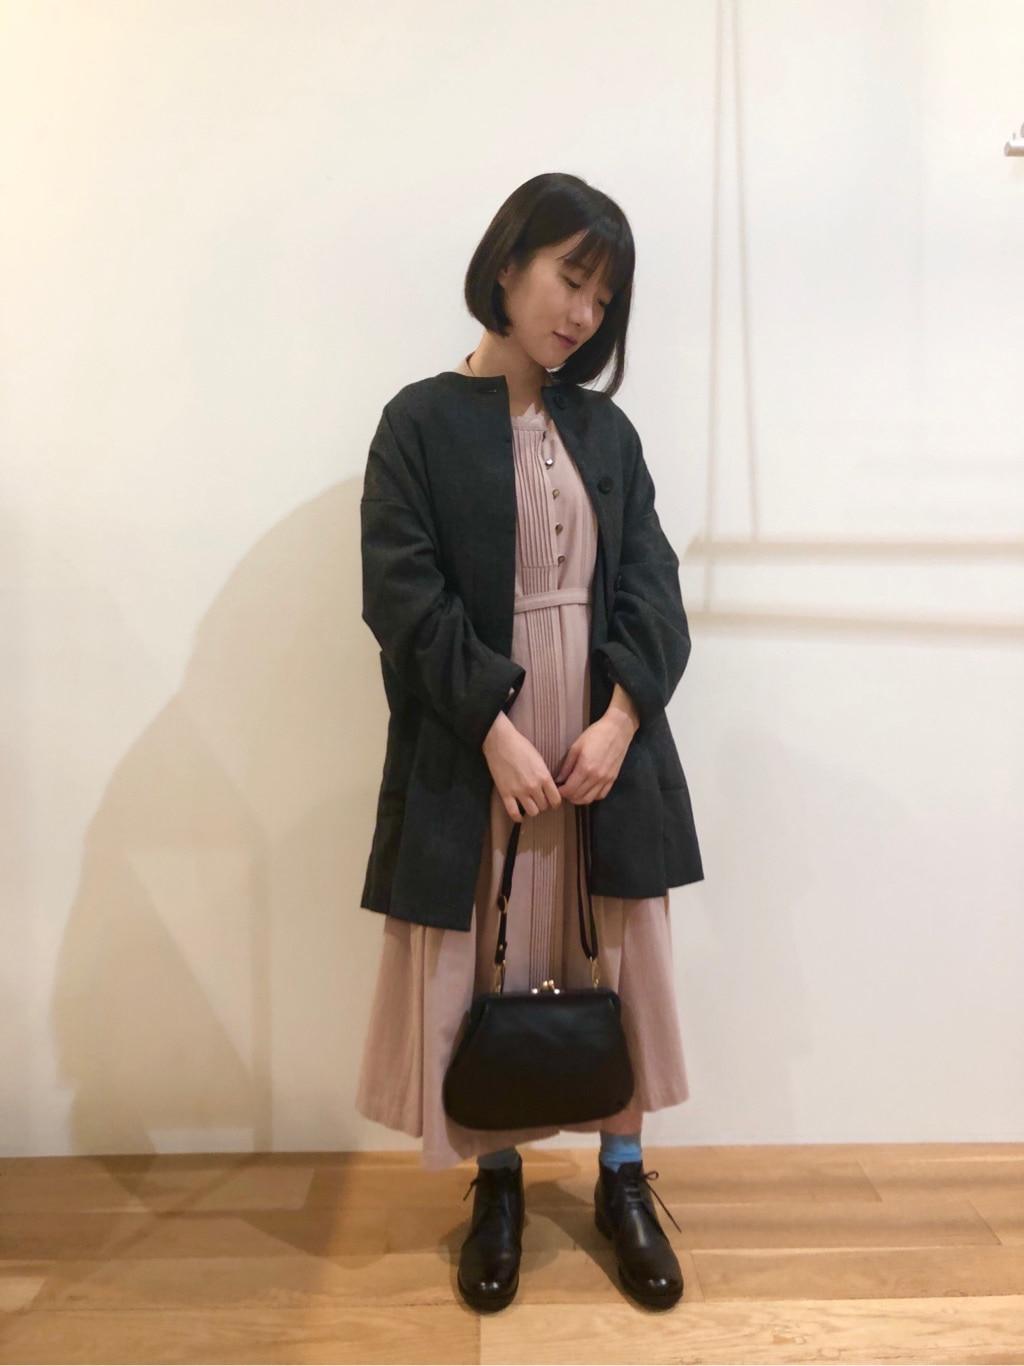 bulle de savon KITTE丸の内 身長:152cm 2020.10.19